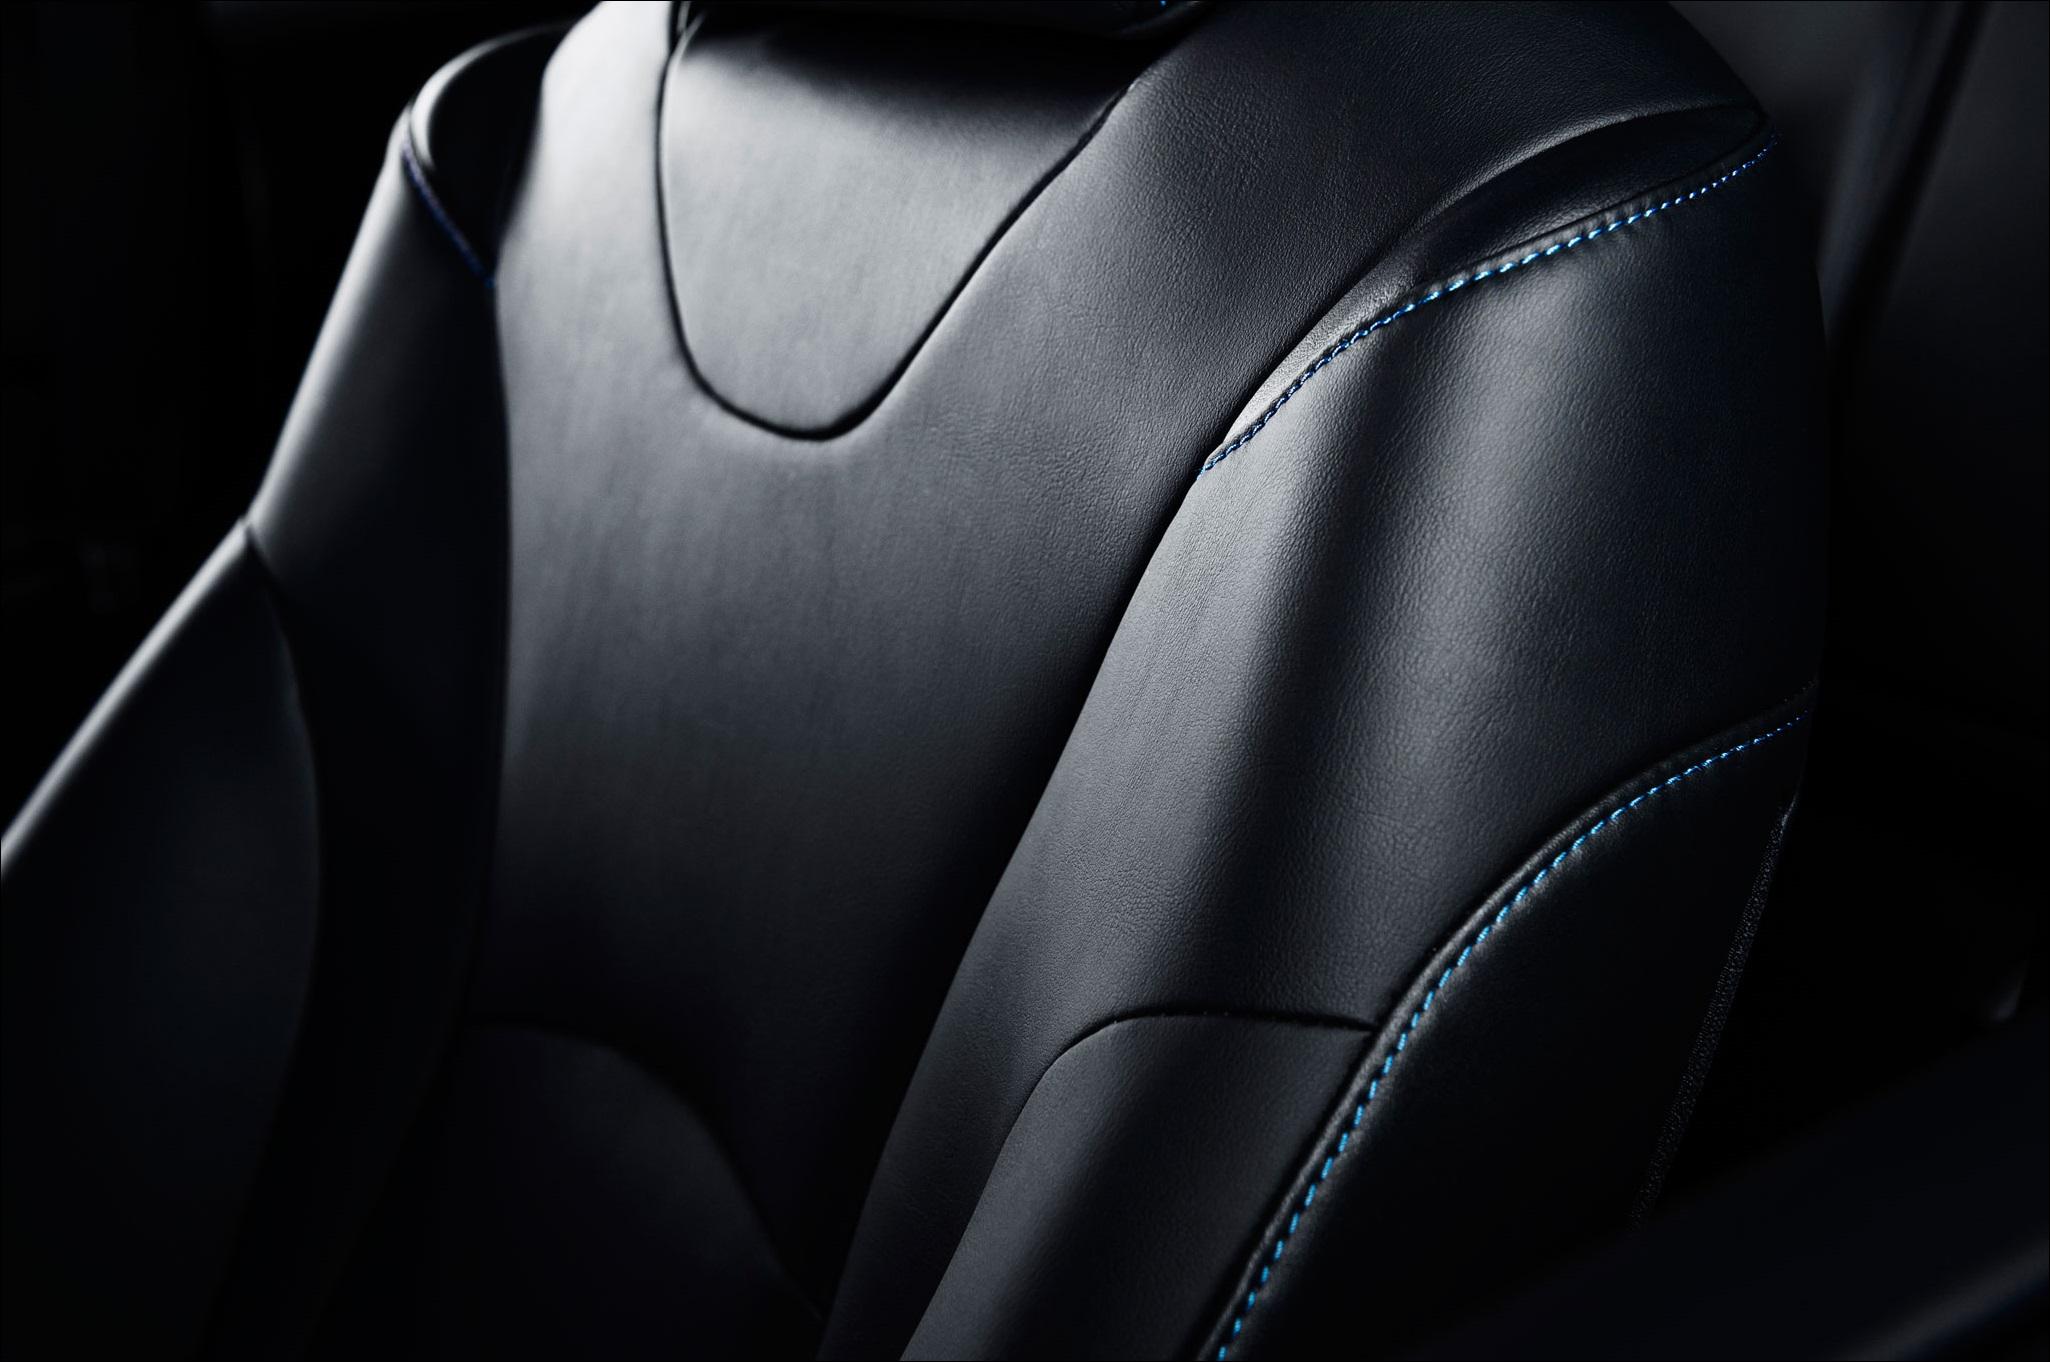 2016-toyota-prius-interior-seat-with-stitching